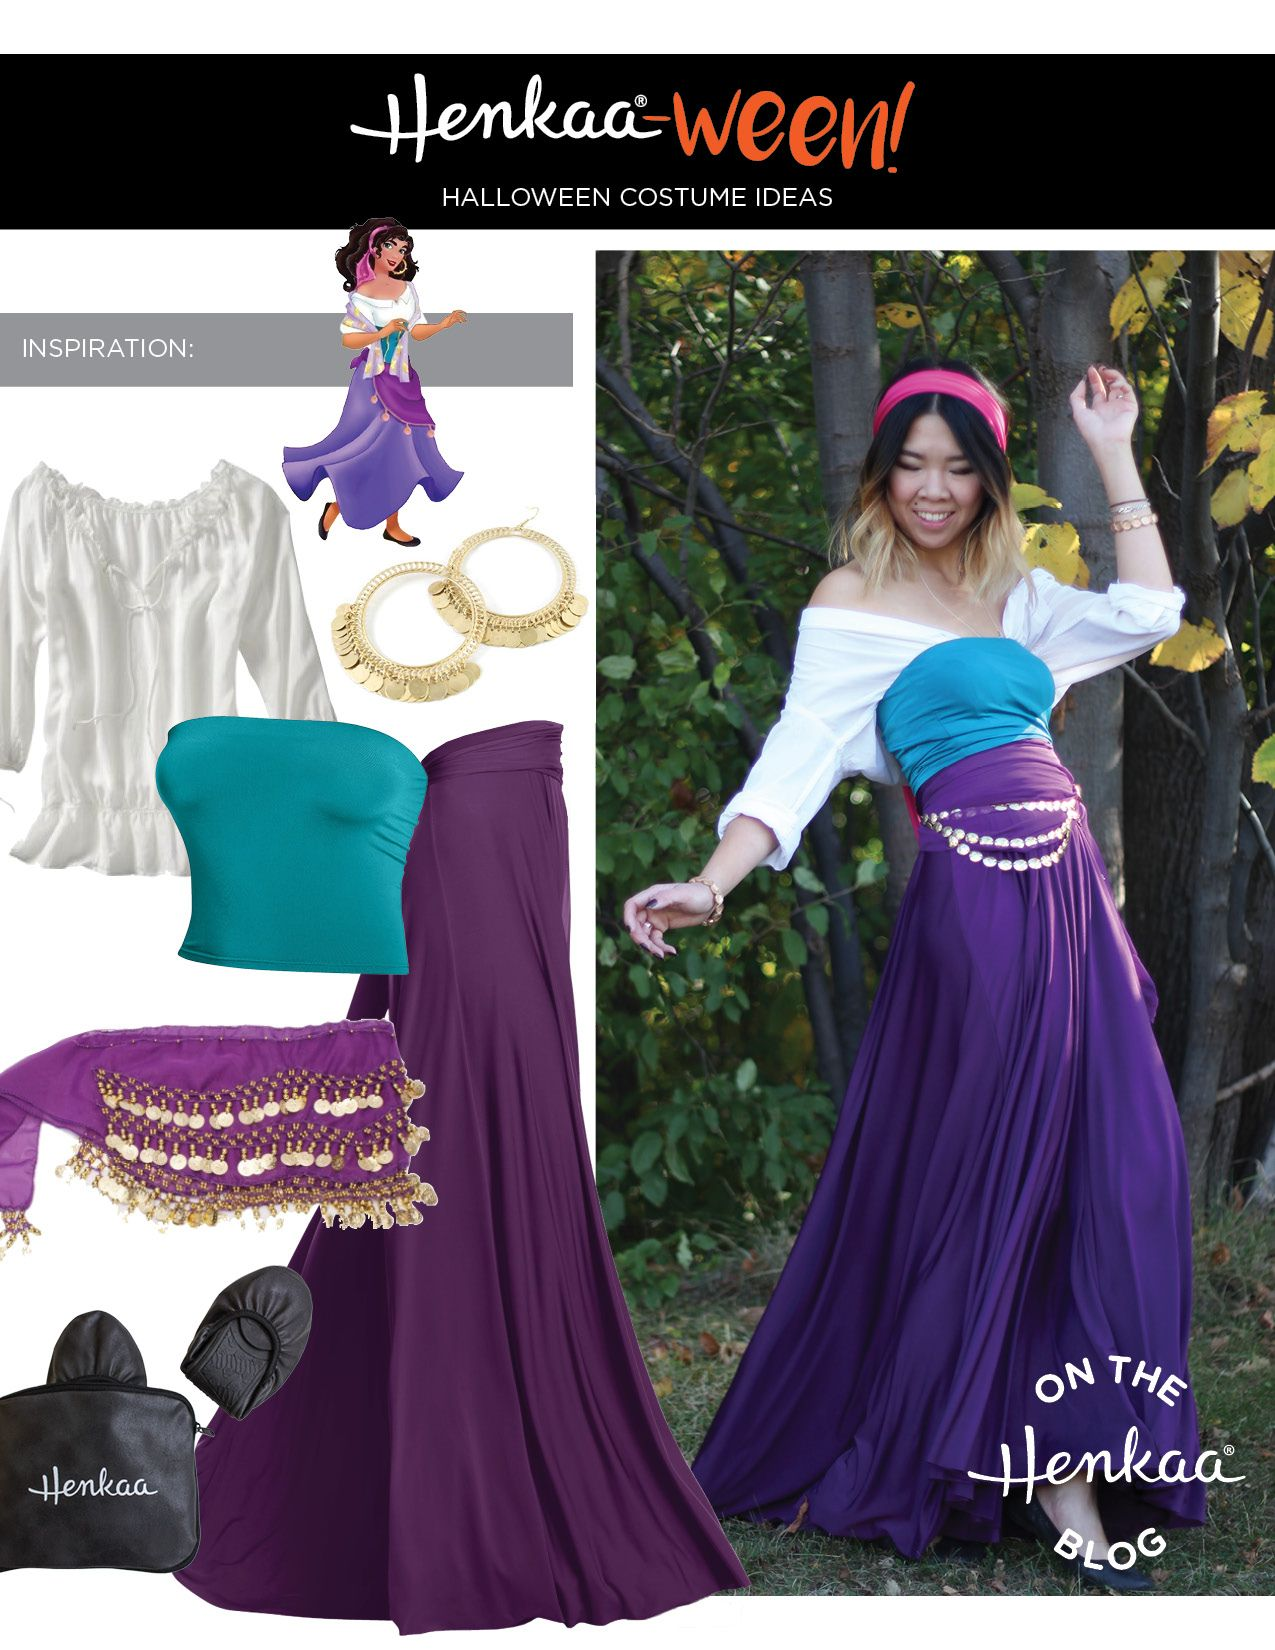 My Homemade Esmeralda costume |Diy Esmeralda Costume